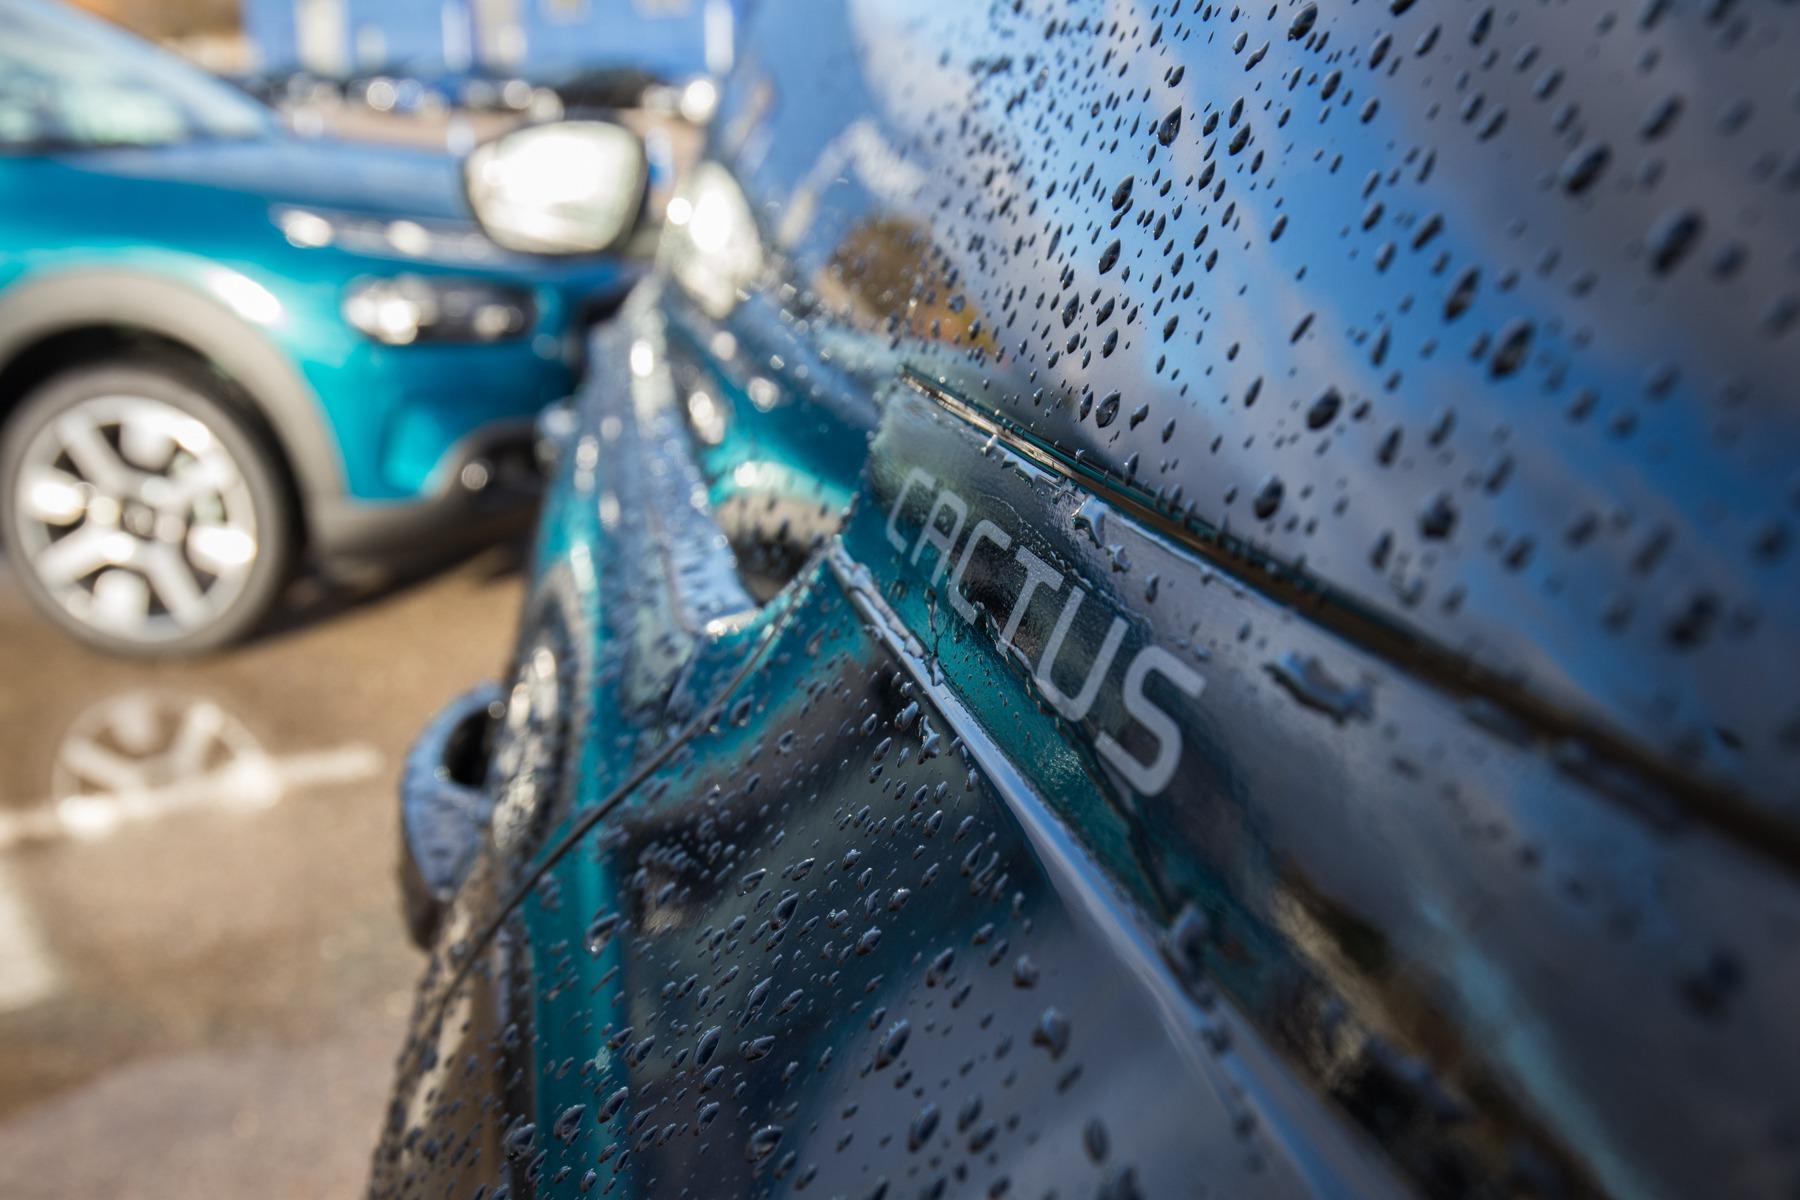 Adaptar coche para la lluvia: Protectores, repelente, sensores…